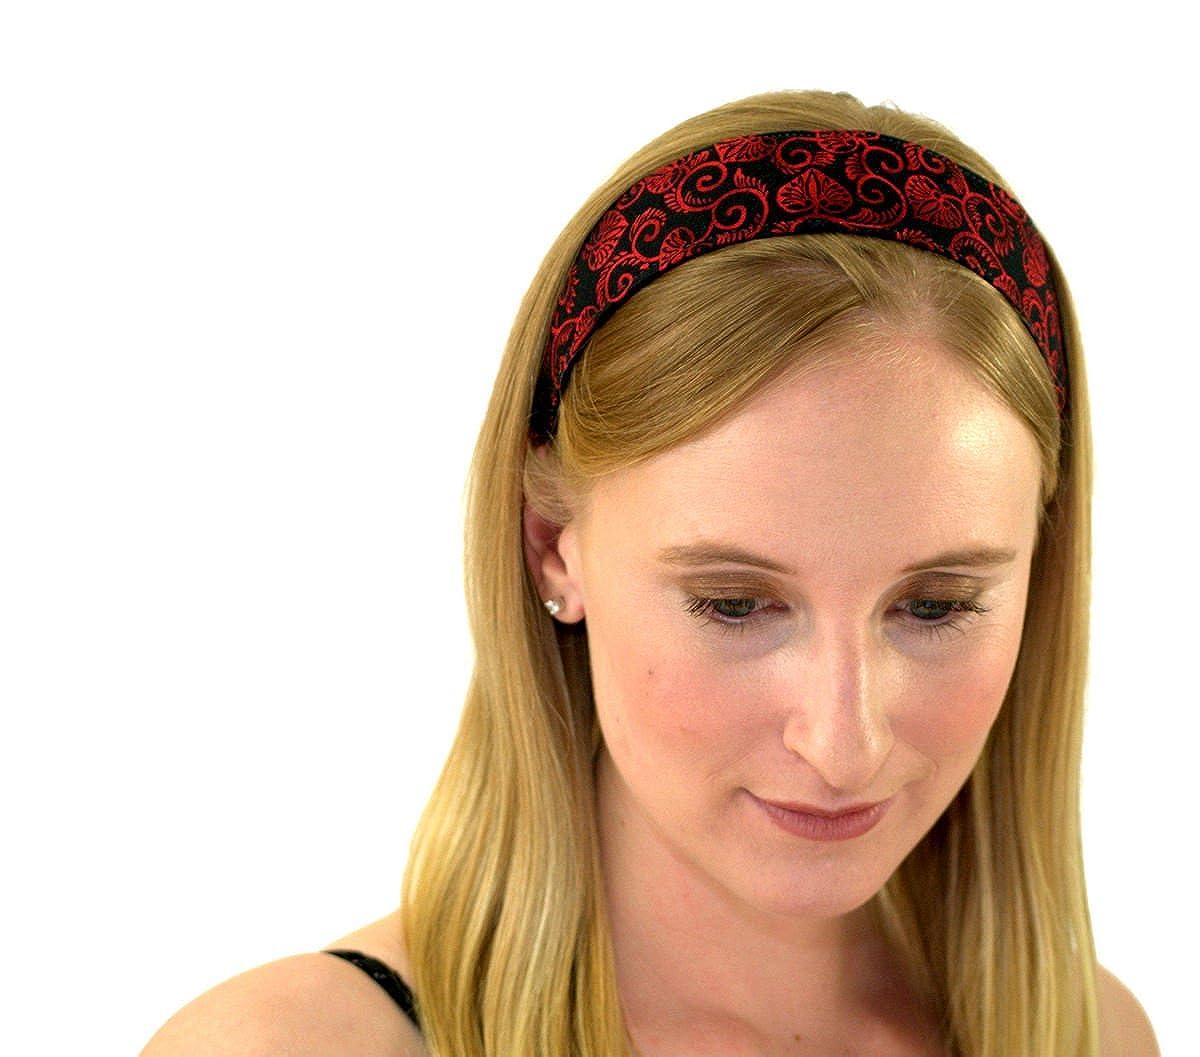 Skinny Headband Delicate Red Leaves OverブラックソフトBoho Running Headwrap Womens B0037USPW0